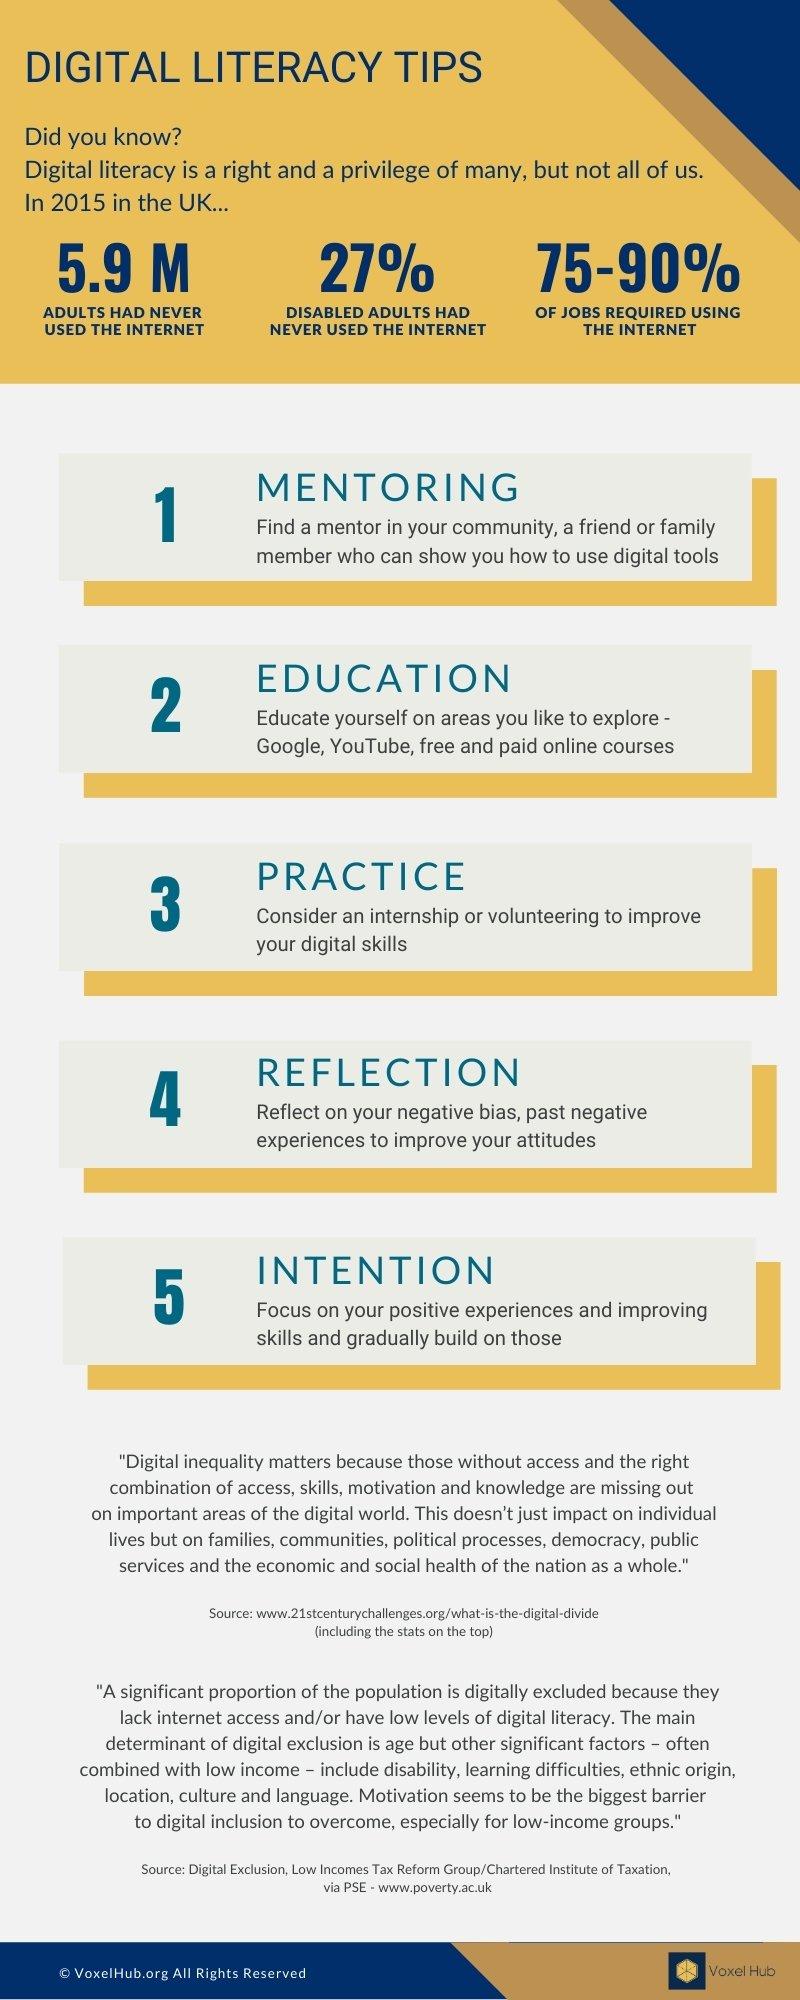 Digital Literacy Tips